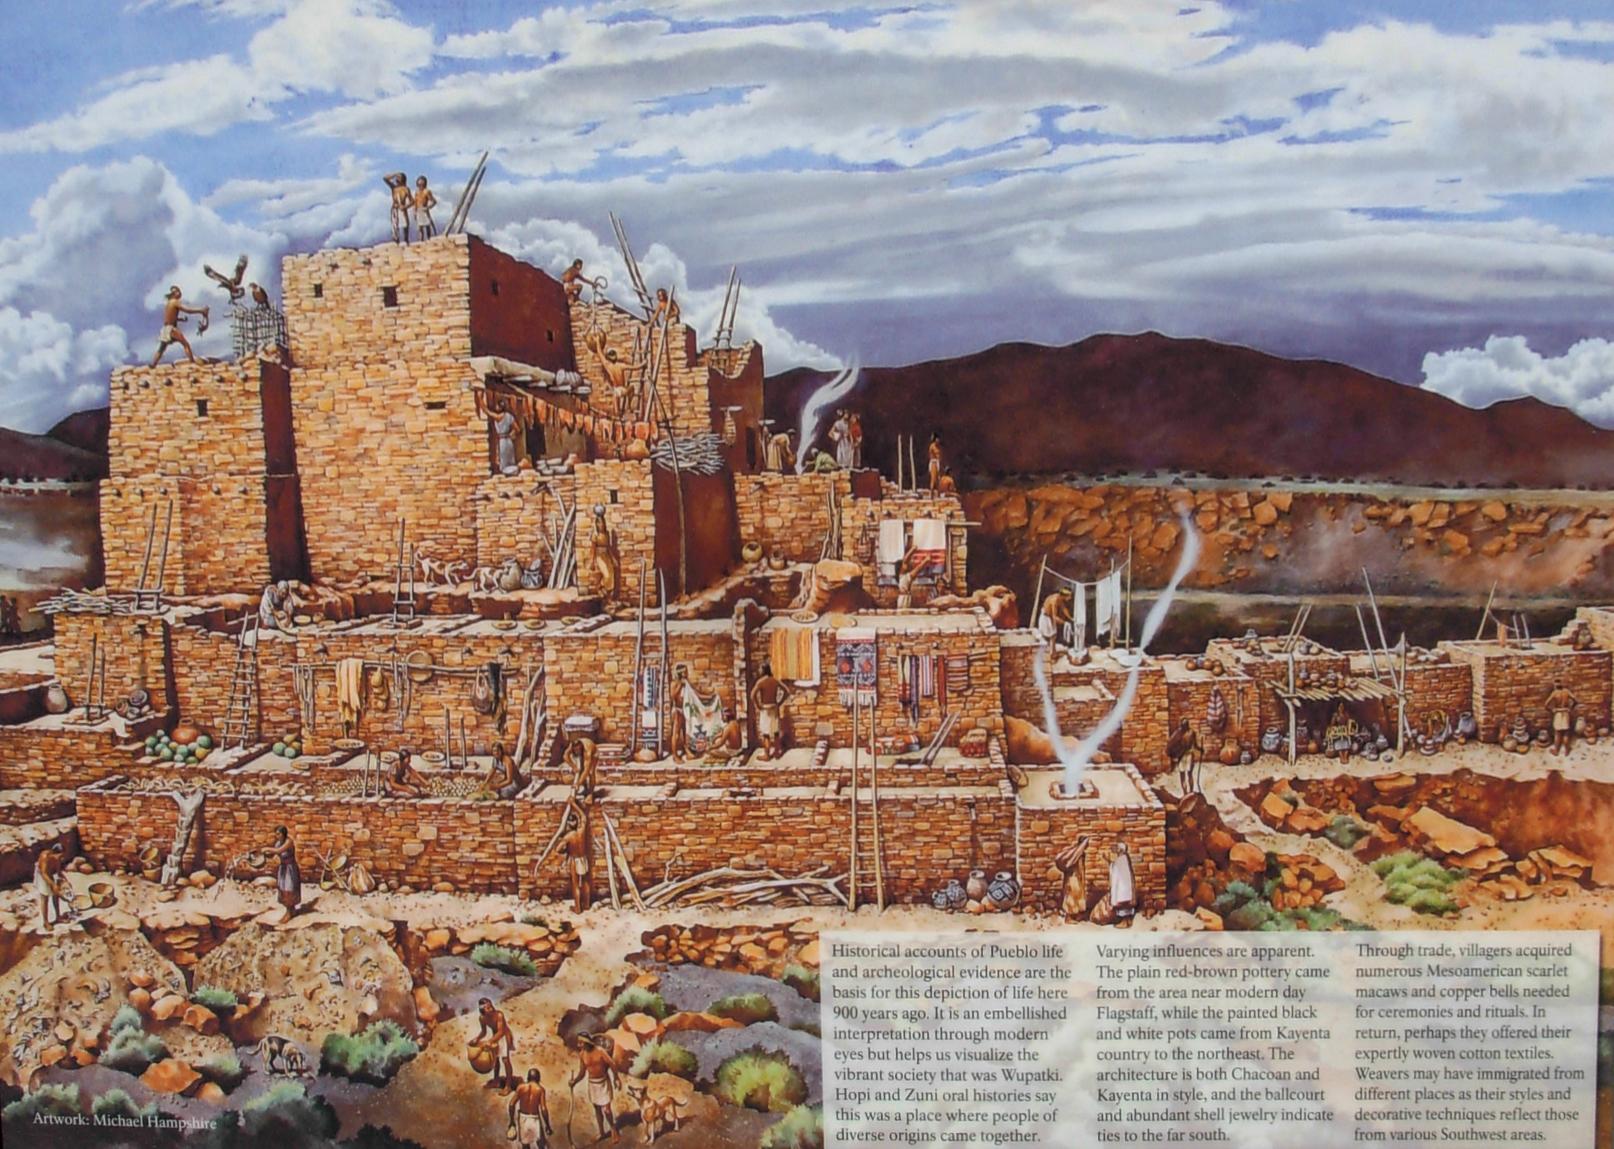 Interpretation panel on the overlook for Wupatki Pueblo